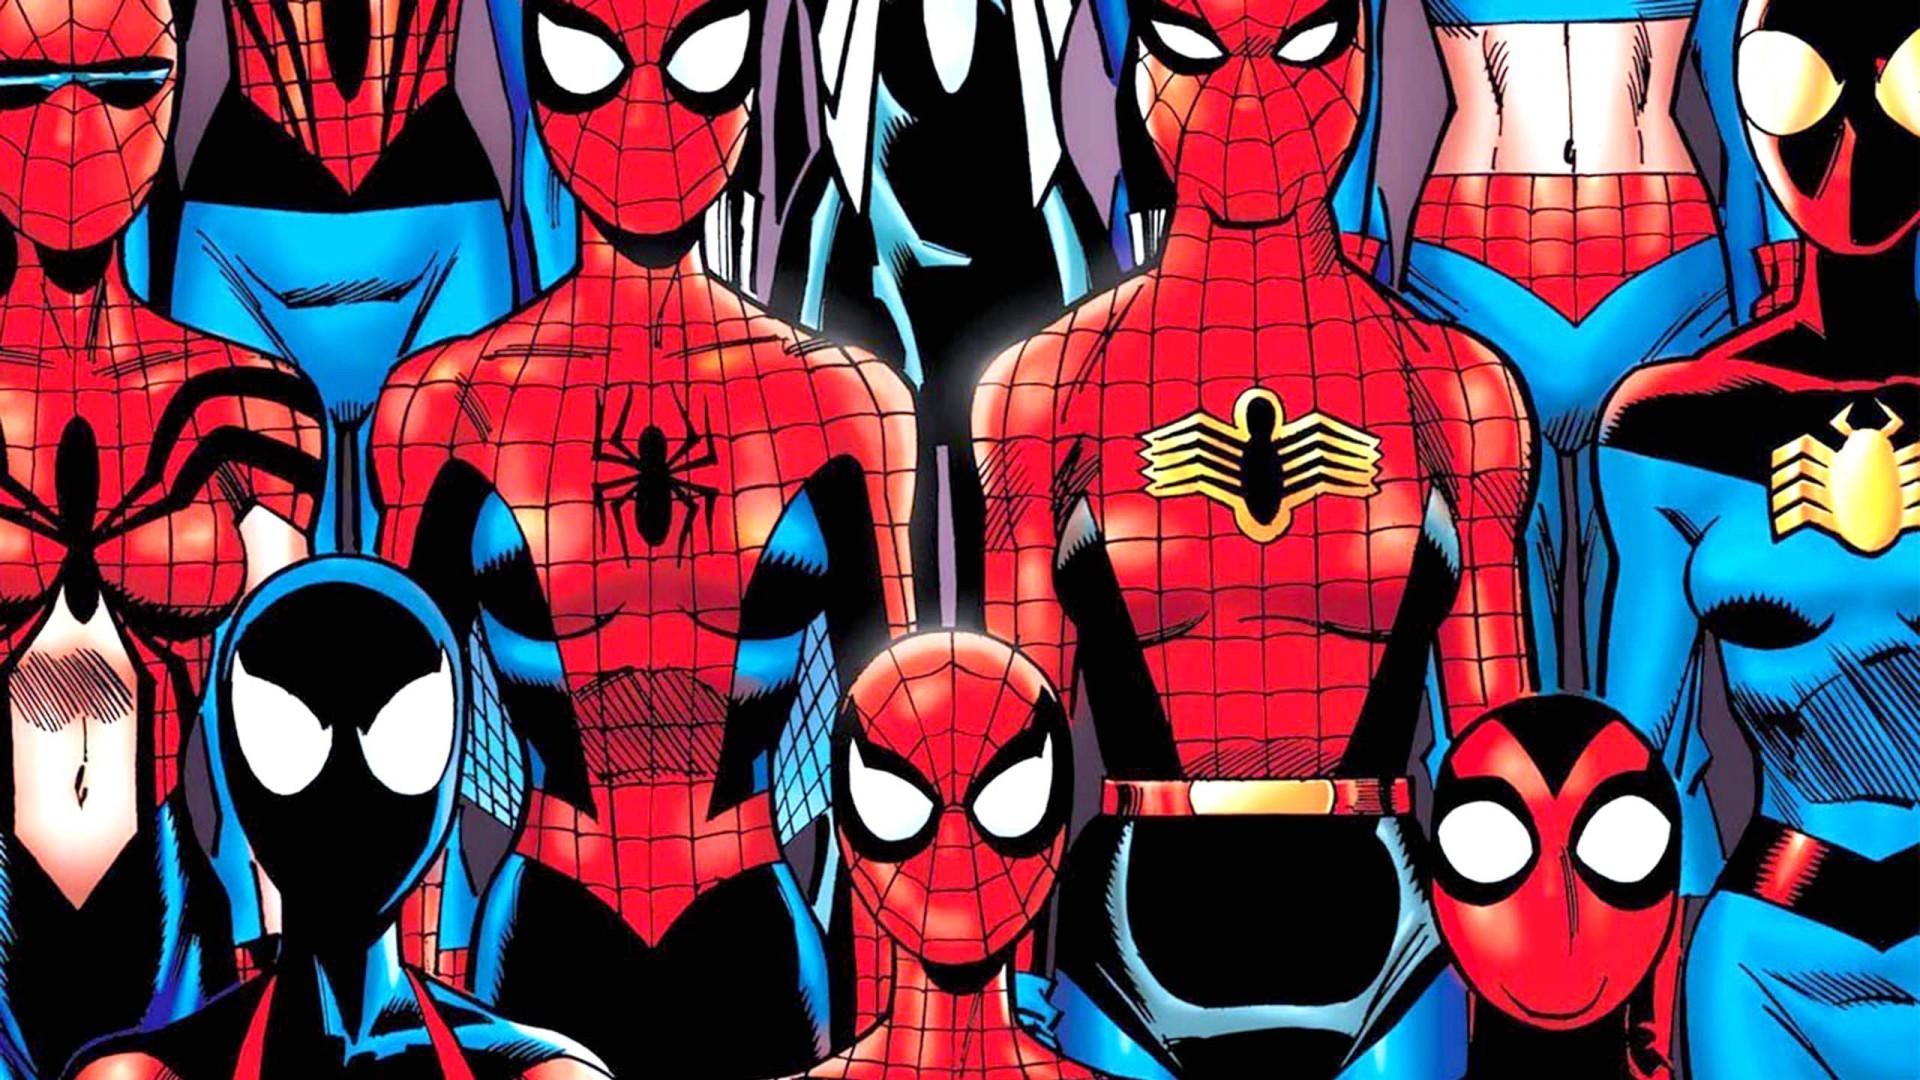 spiderman deadpool – 1080 HD Wallpaper